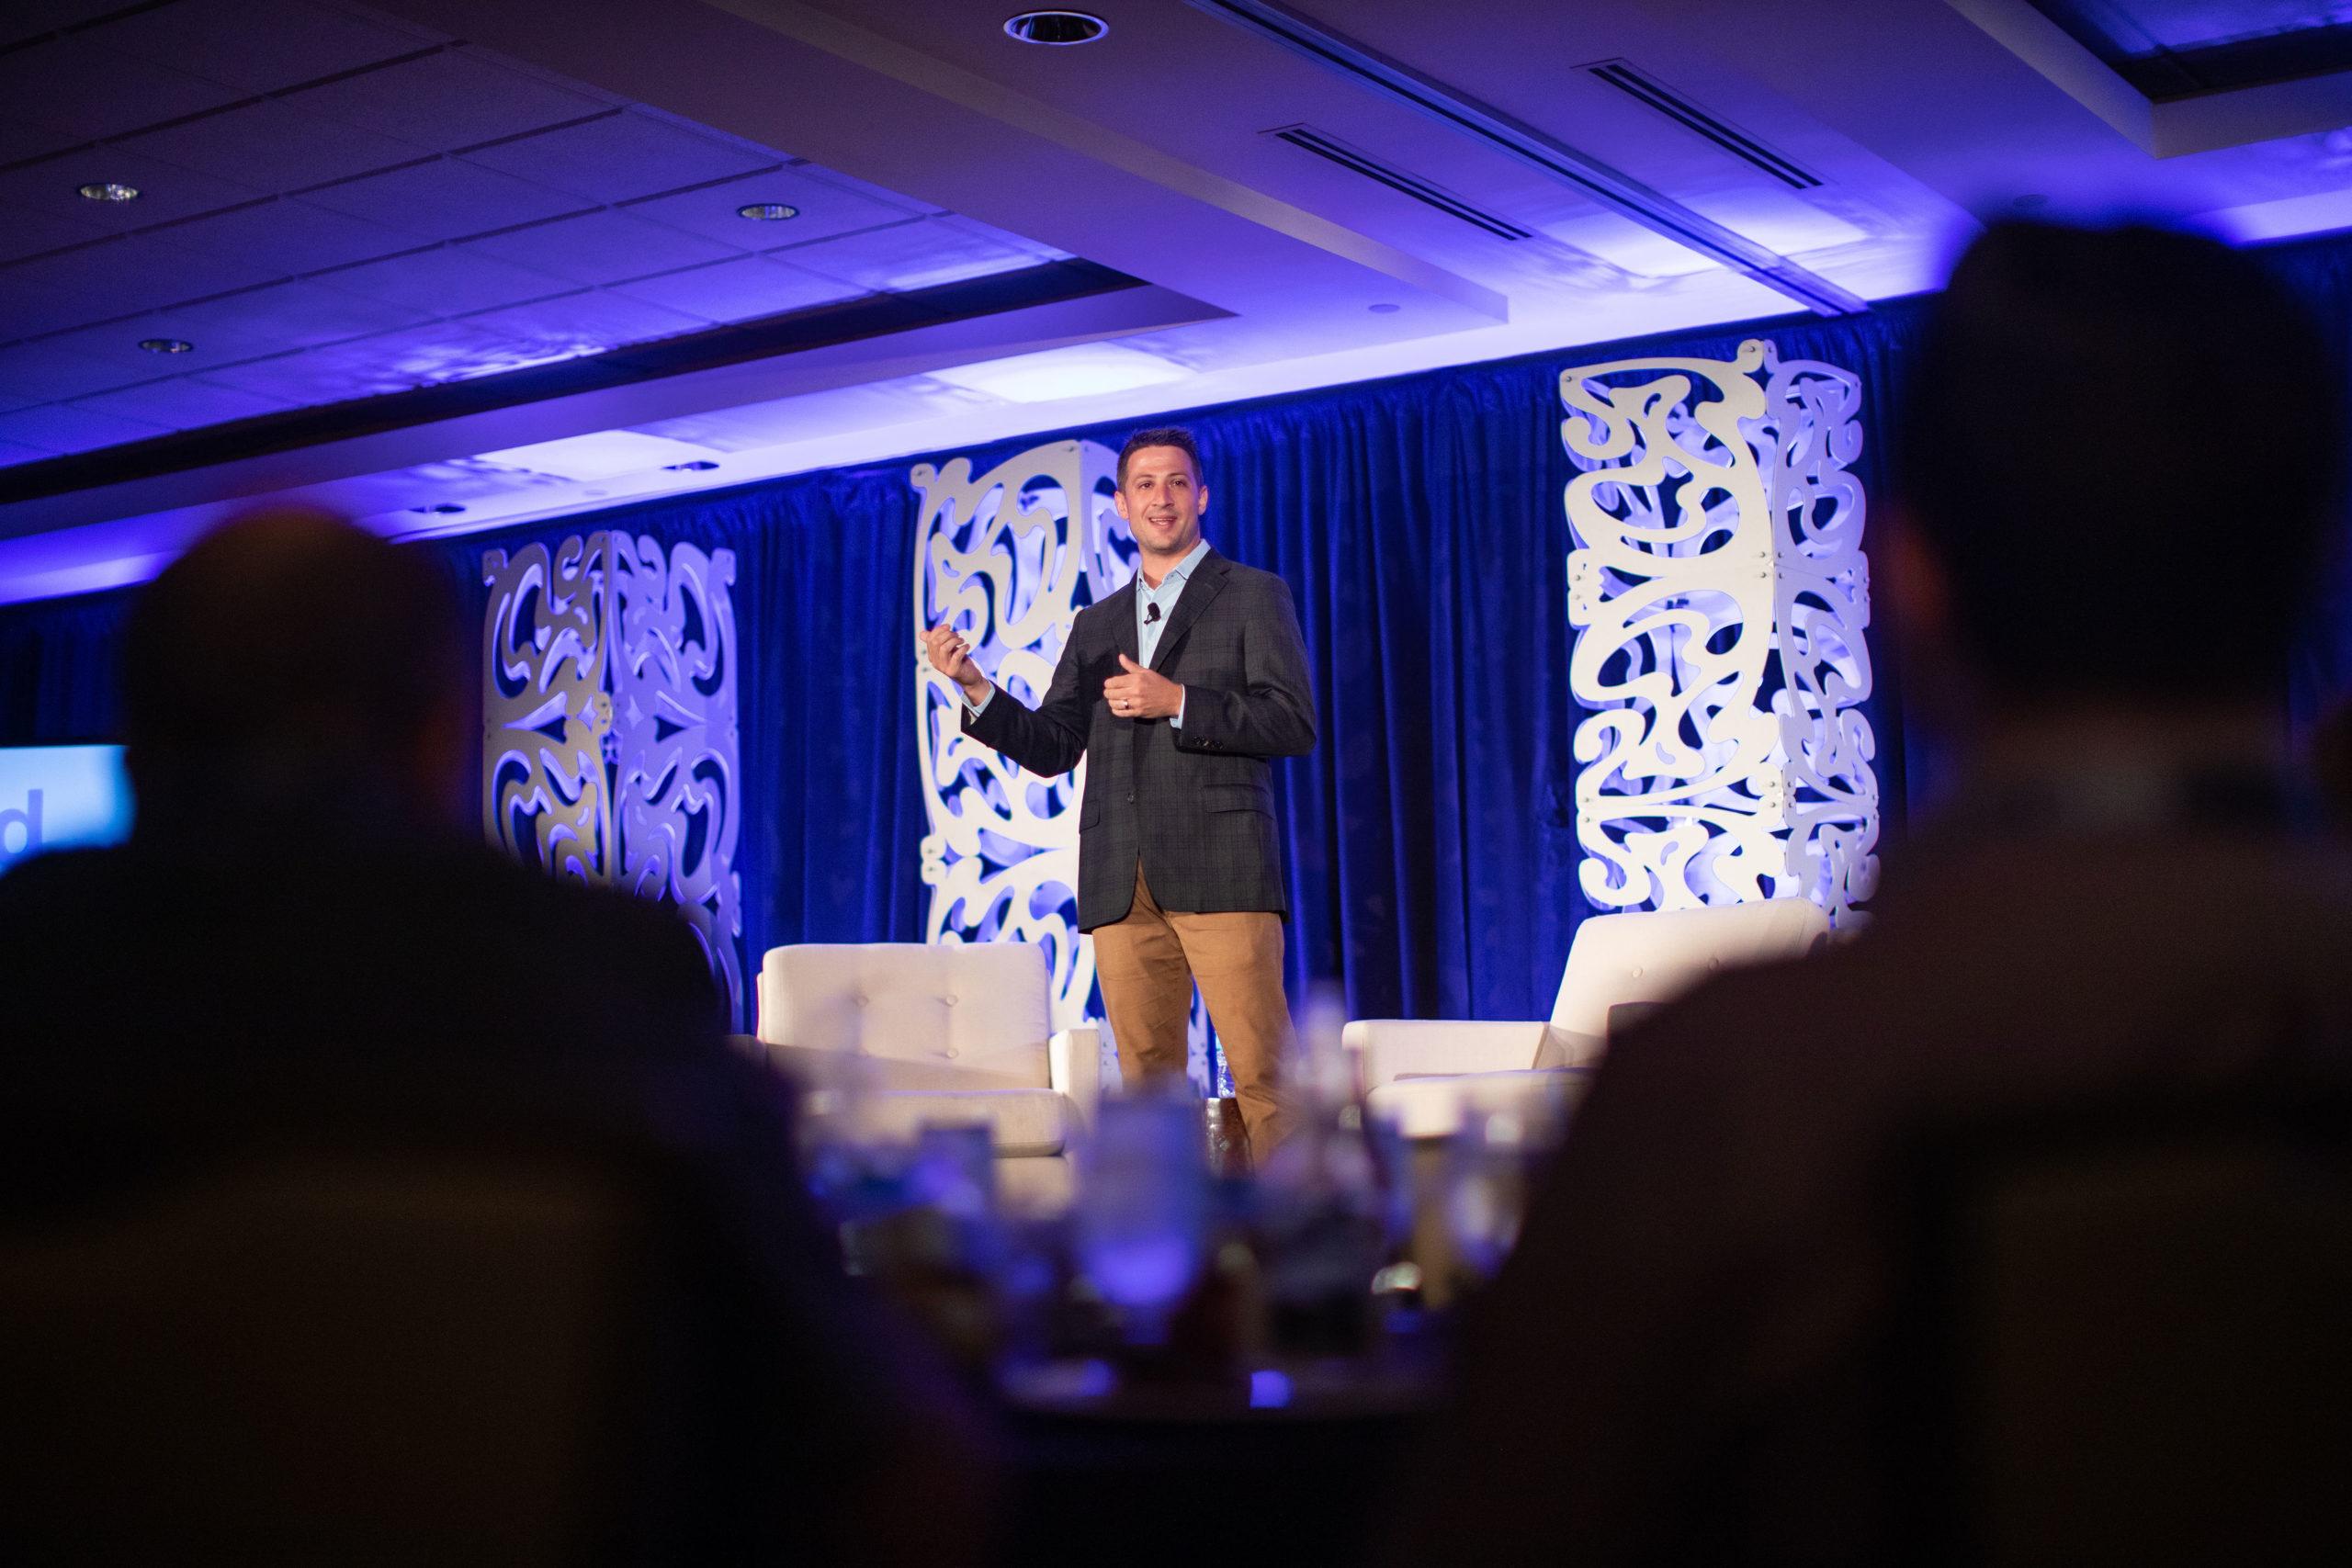 Evan Feinberg presenting at Catalyst event in Denver 2019